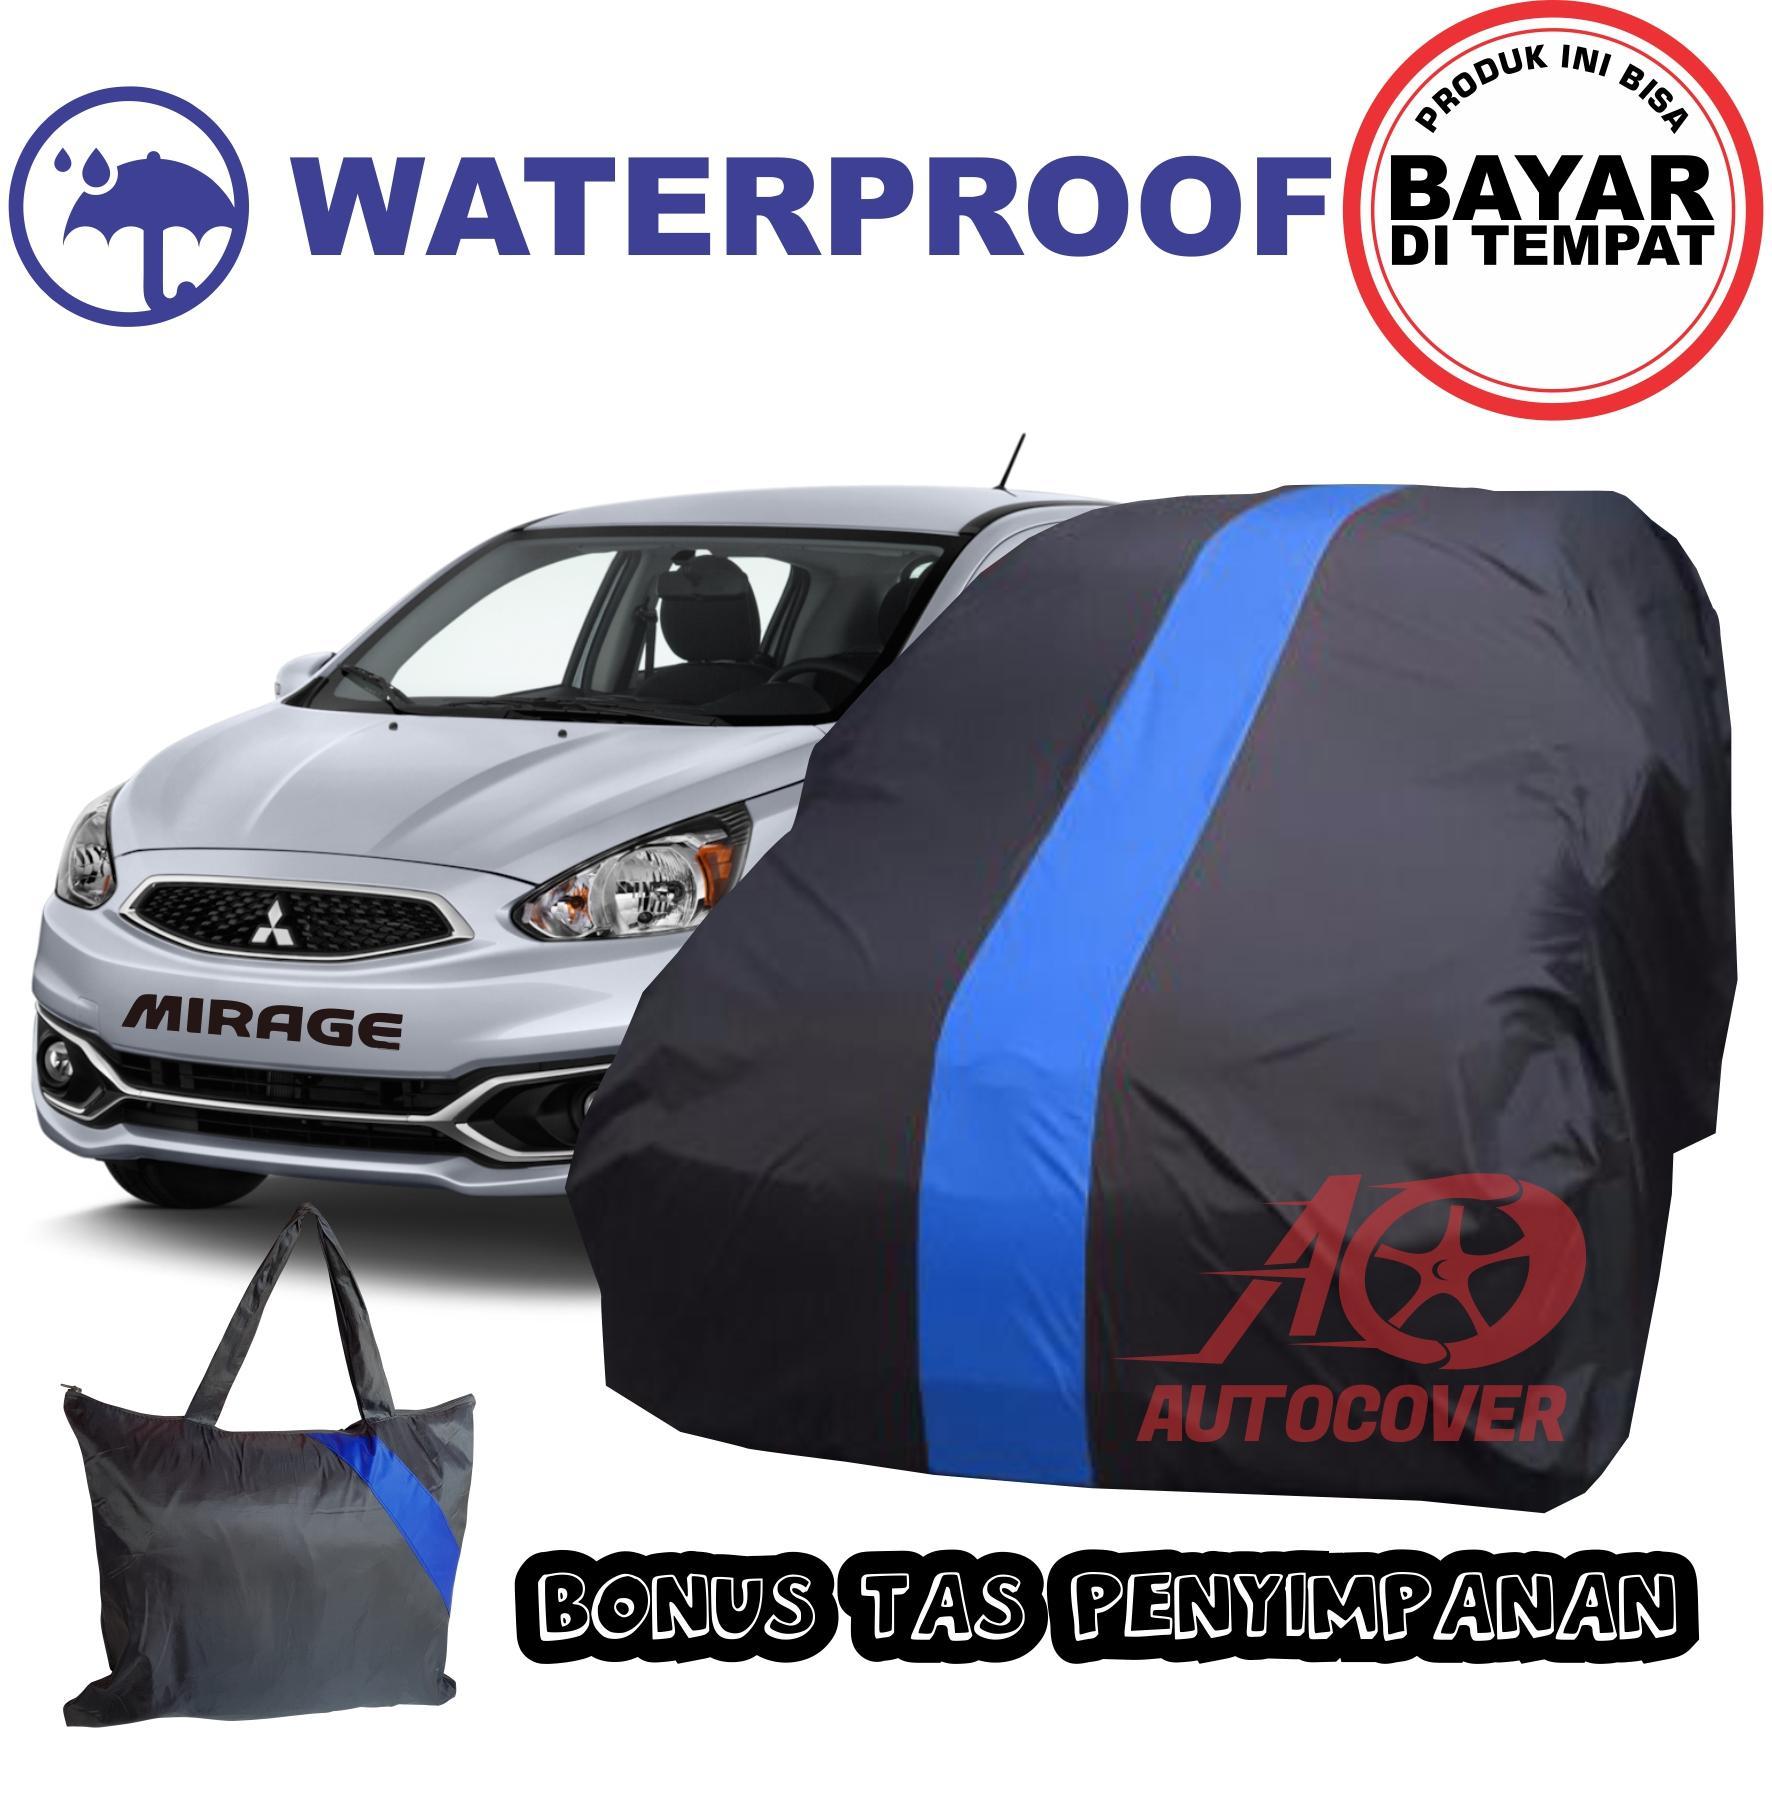 COD - Sarung Bodi Mobil Mitsubishi MIRAGE Anti Air List BIRU Auto Cover Body Waterproof Selimut Pen